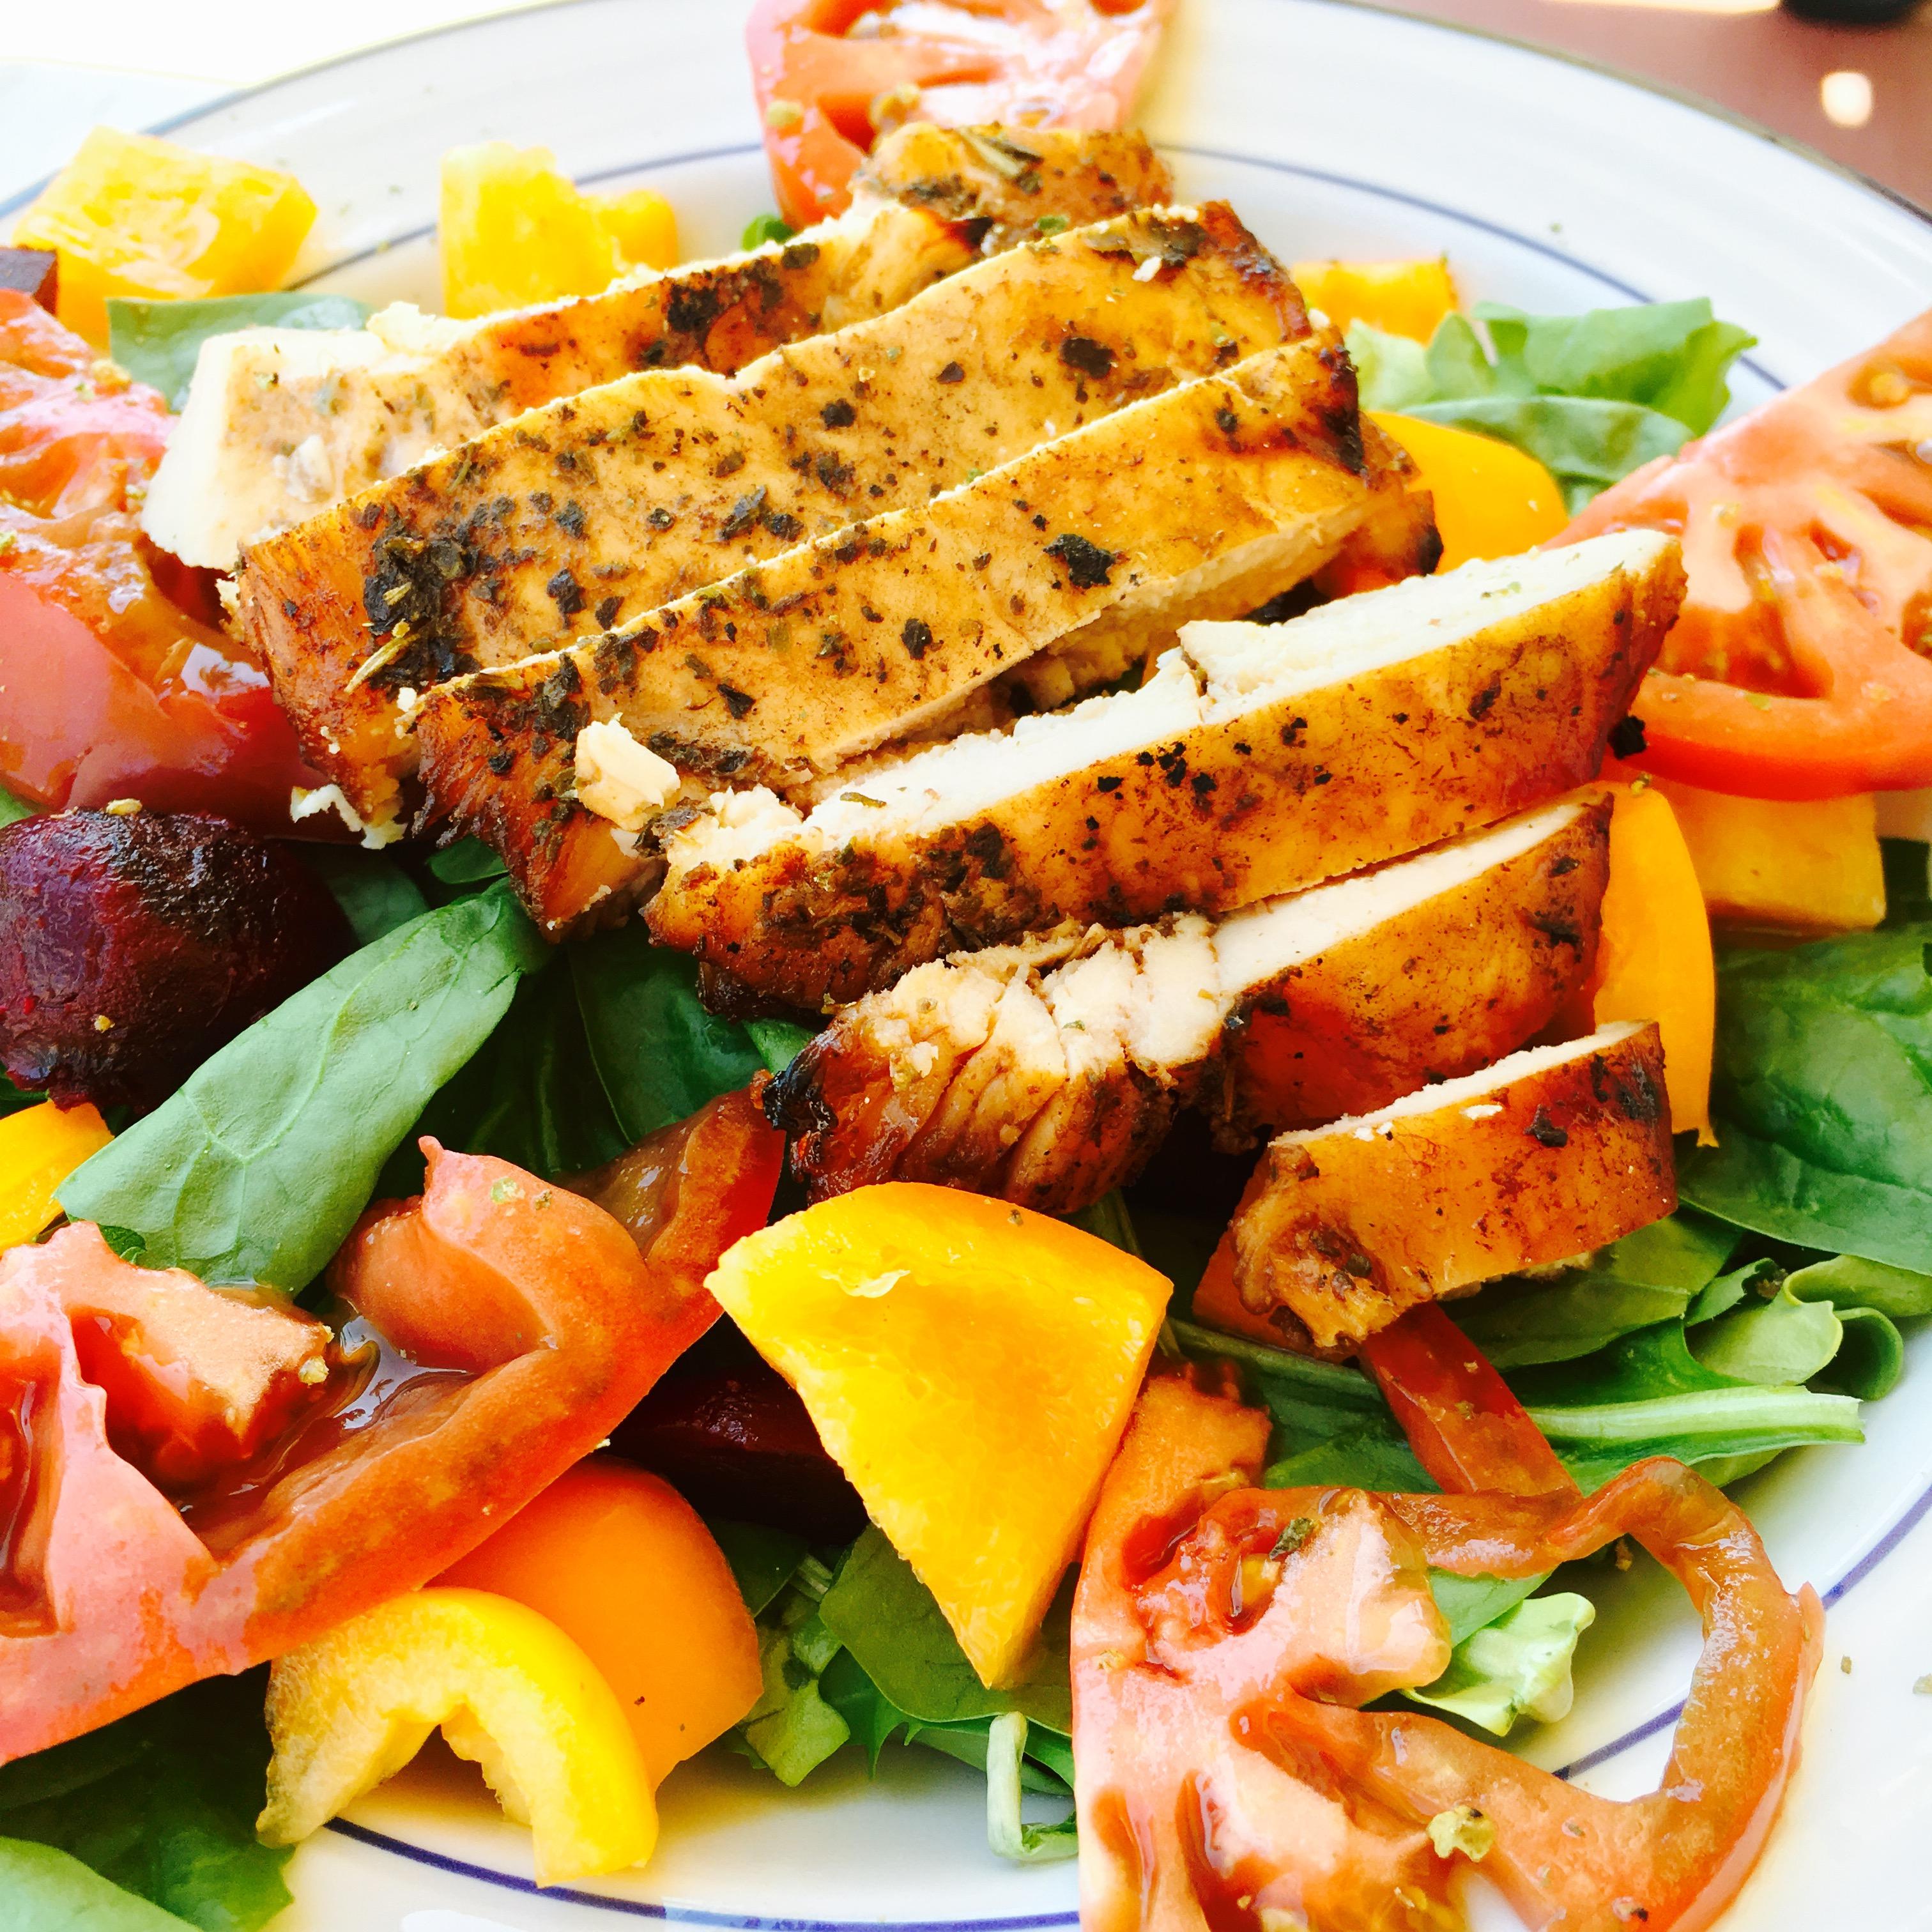 balsamic-marinated-chicken-salad